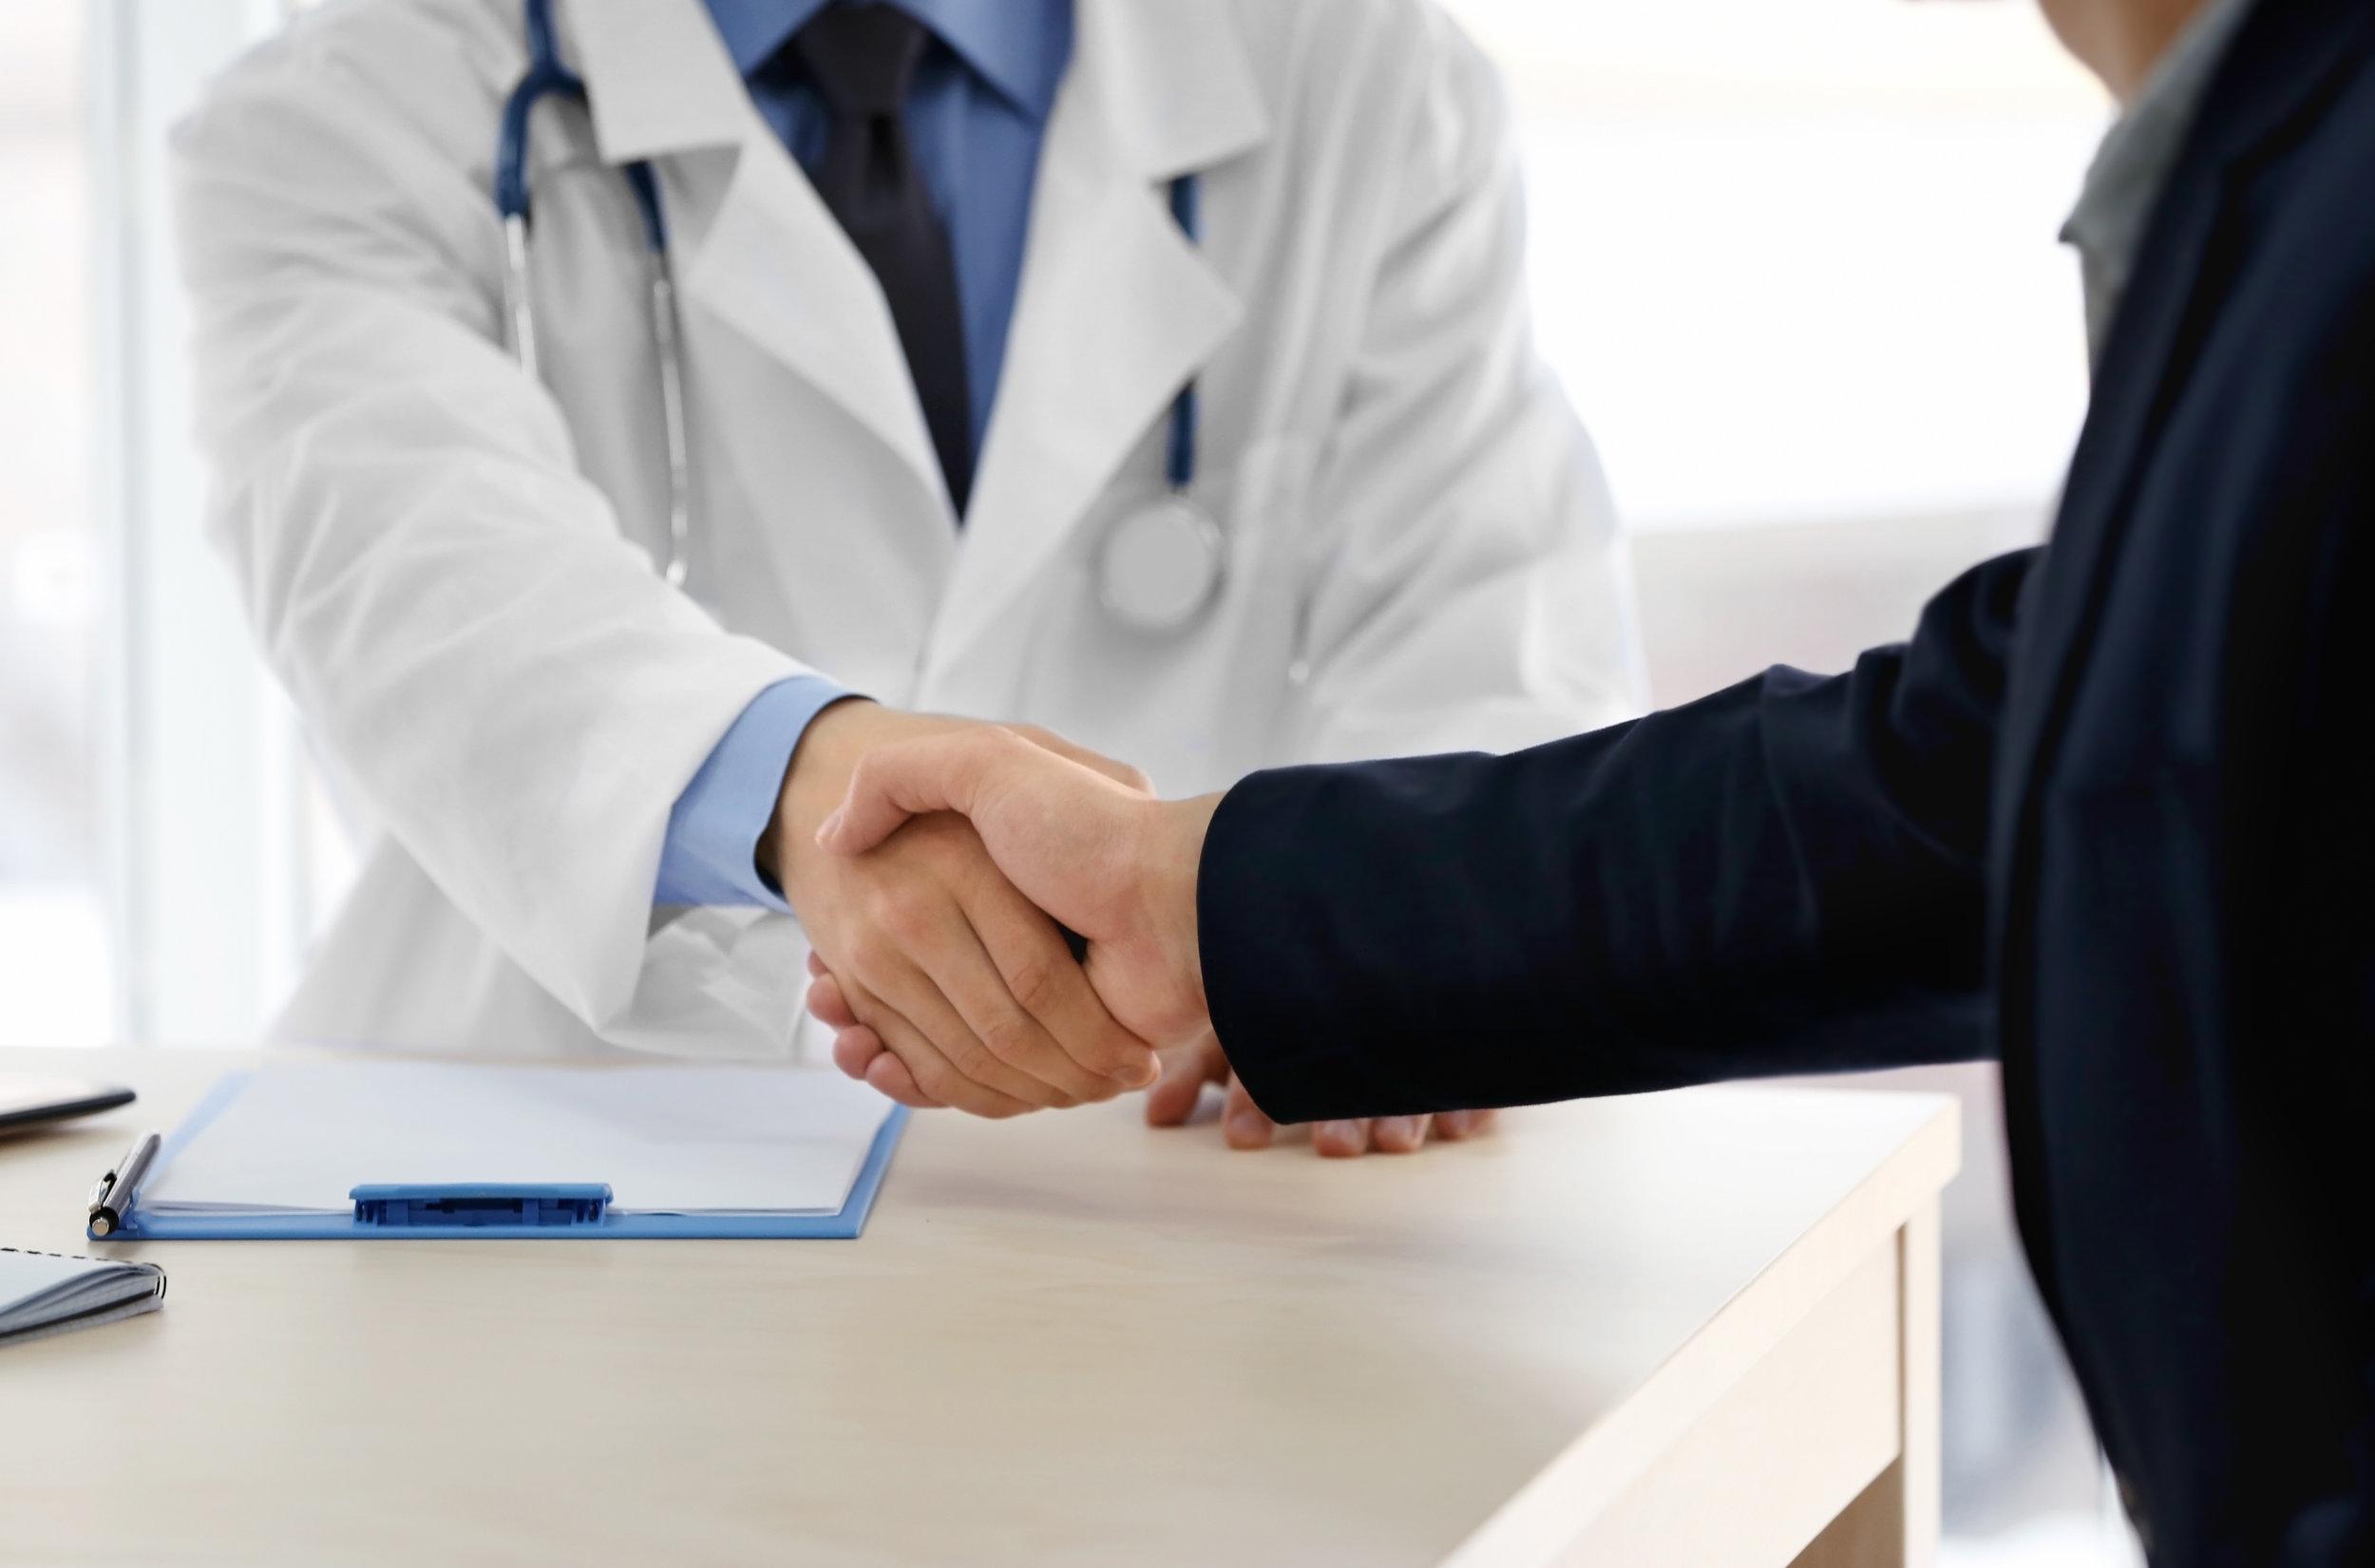 Doctor in Austin, TX Austin Medical Partners